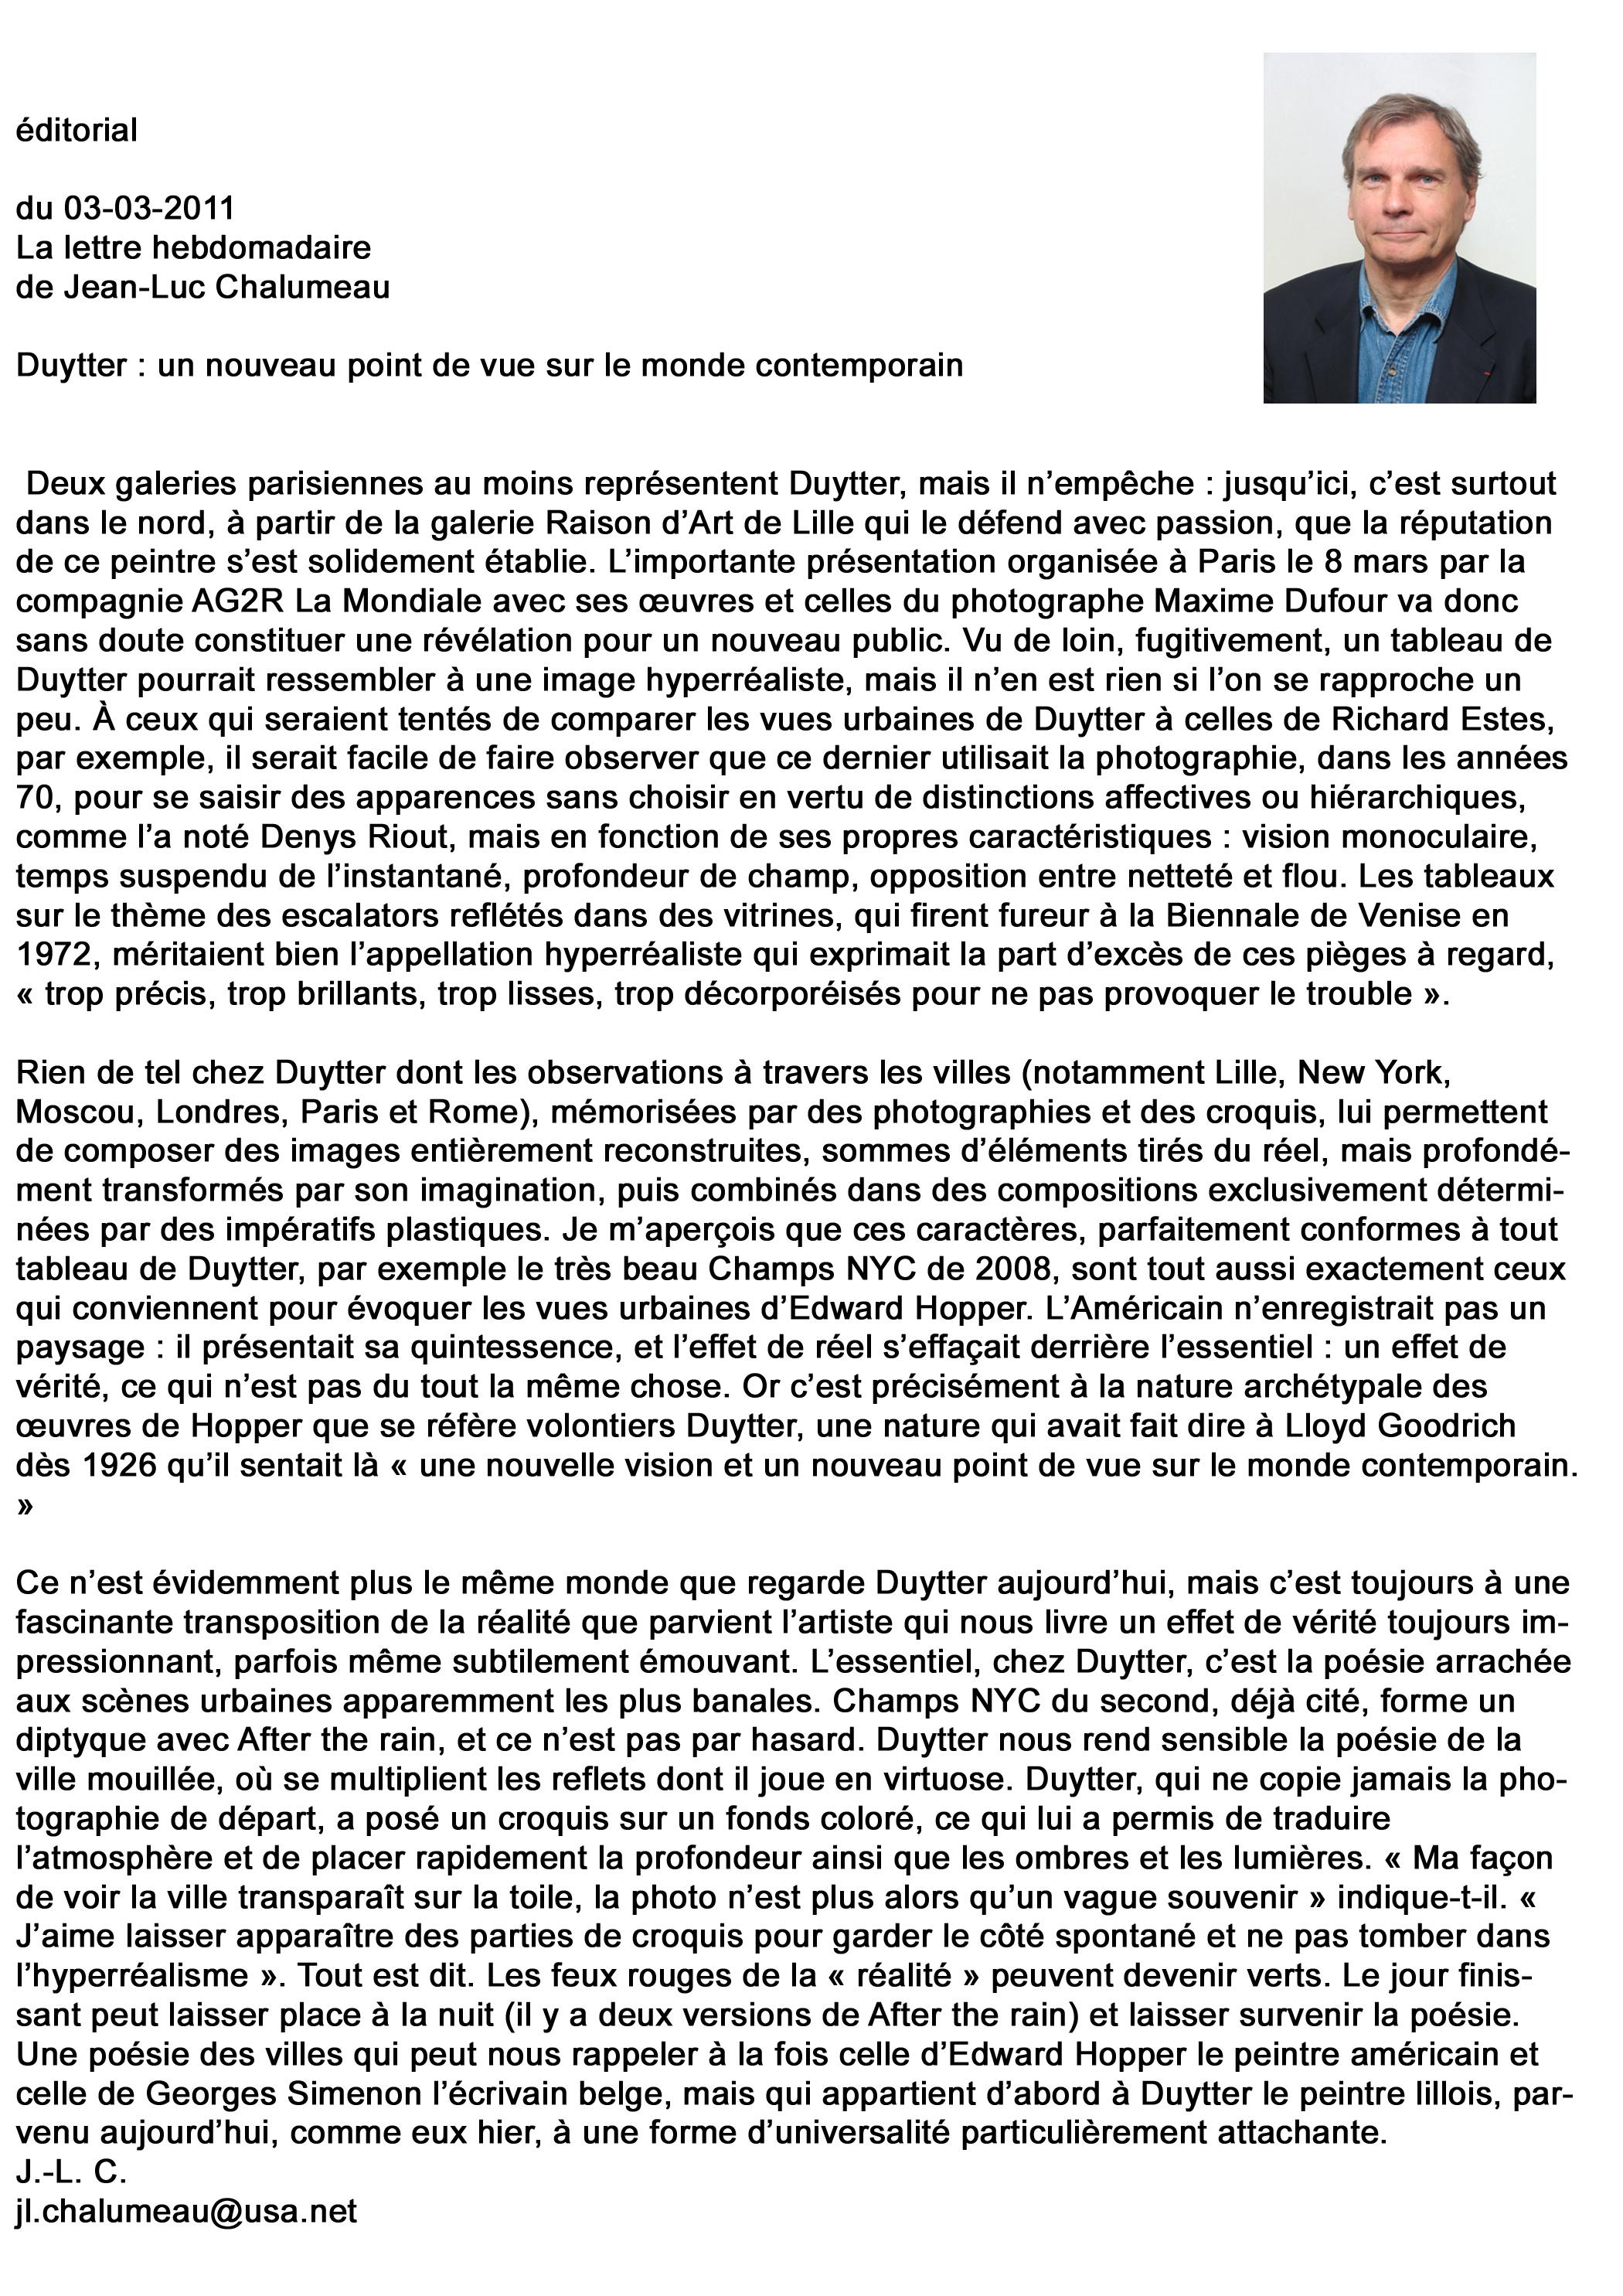 Article Jean-Luc Chalumeau - Duytter.jpg